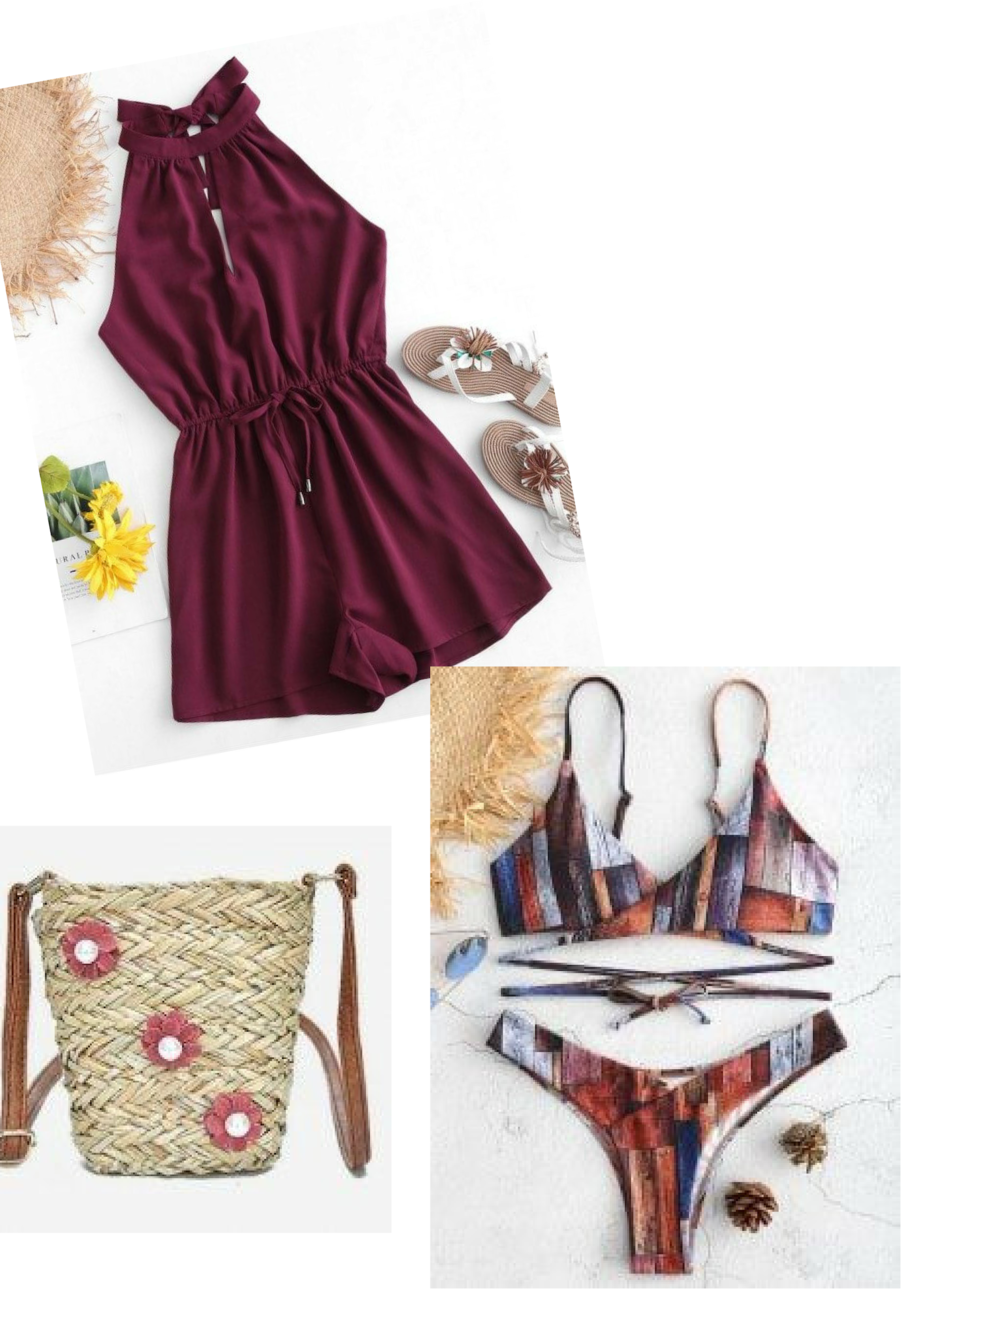 Today's Beach Style Hotlist|  Romper|  Bikini | Straw Bag